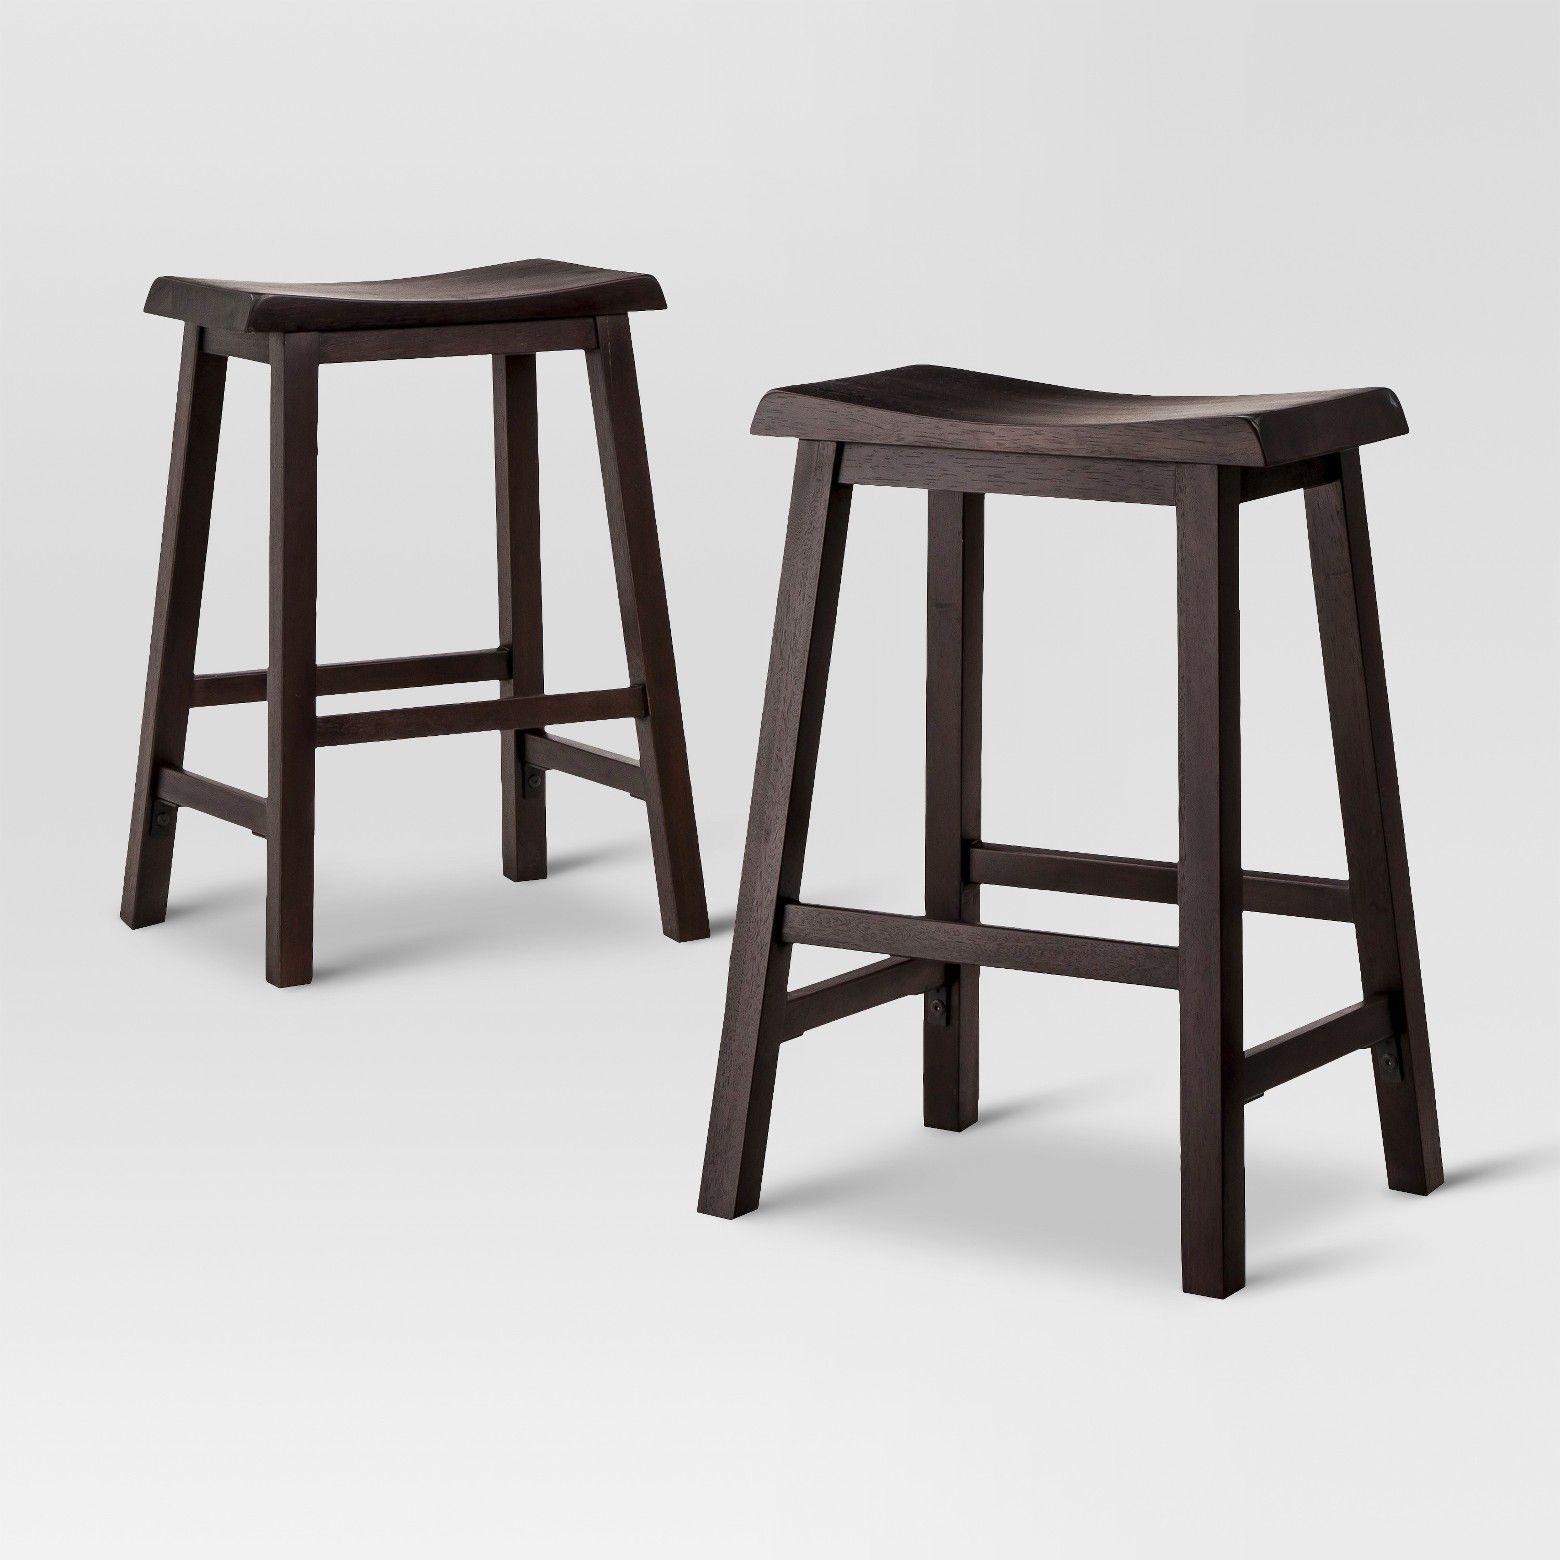 2pk 24 Trenton Counter Stool Black Threshold Saddle Seat Bar Stool Bar Stools Counter Stools